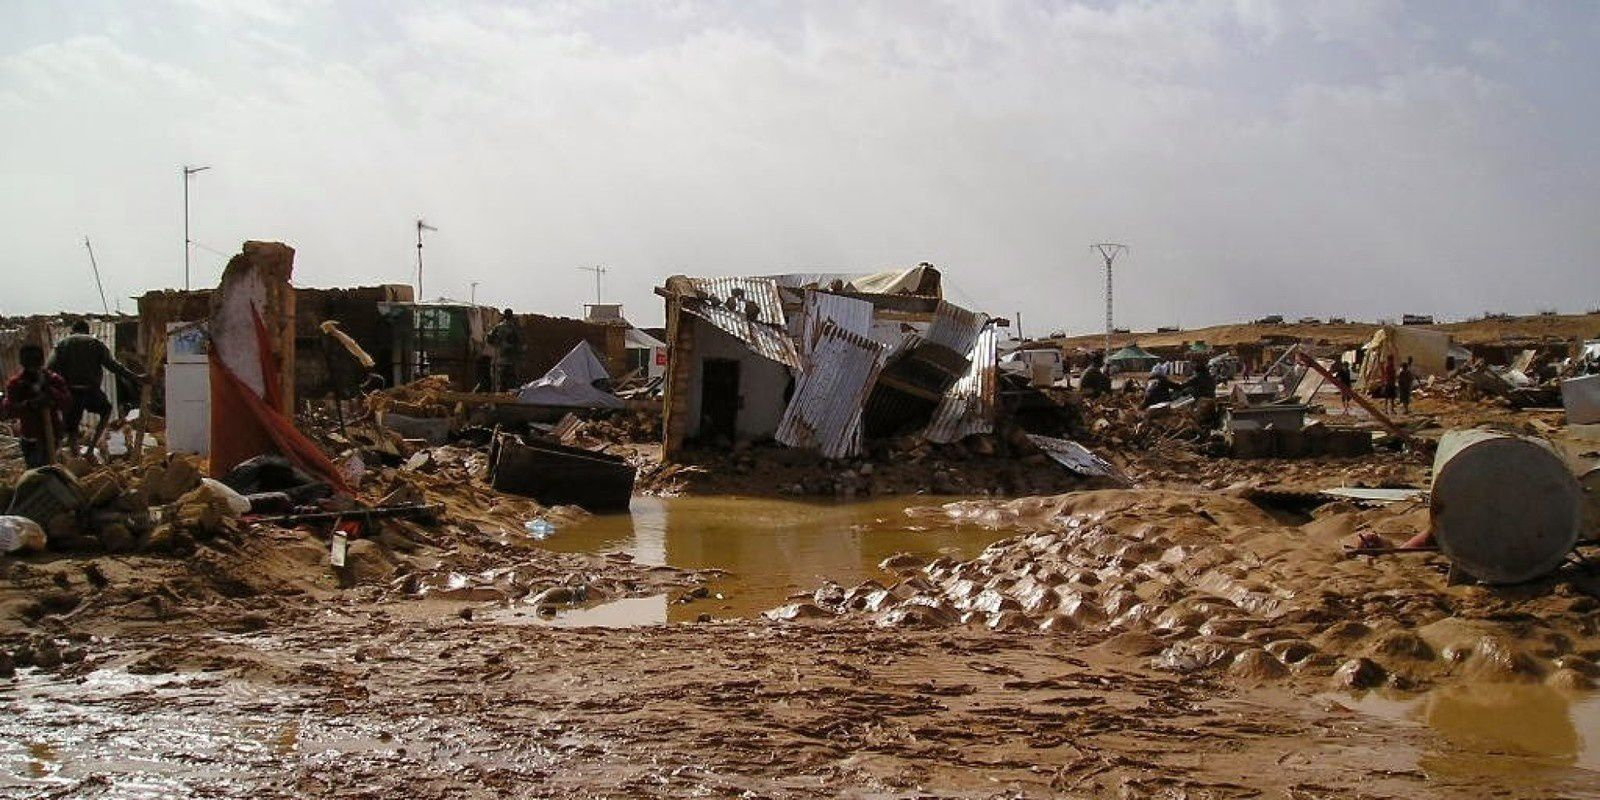 http://img.over-blog-kiwi.com/0/86/47/94/20151029/ob_3993ba_o-inundacion-sahara-facebook.jpg